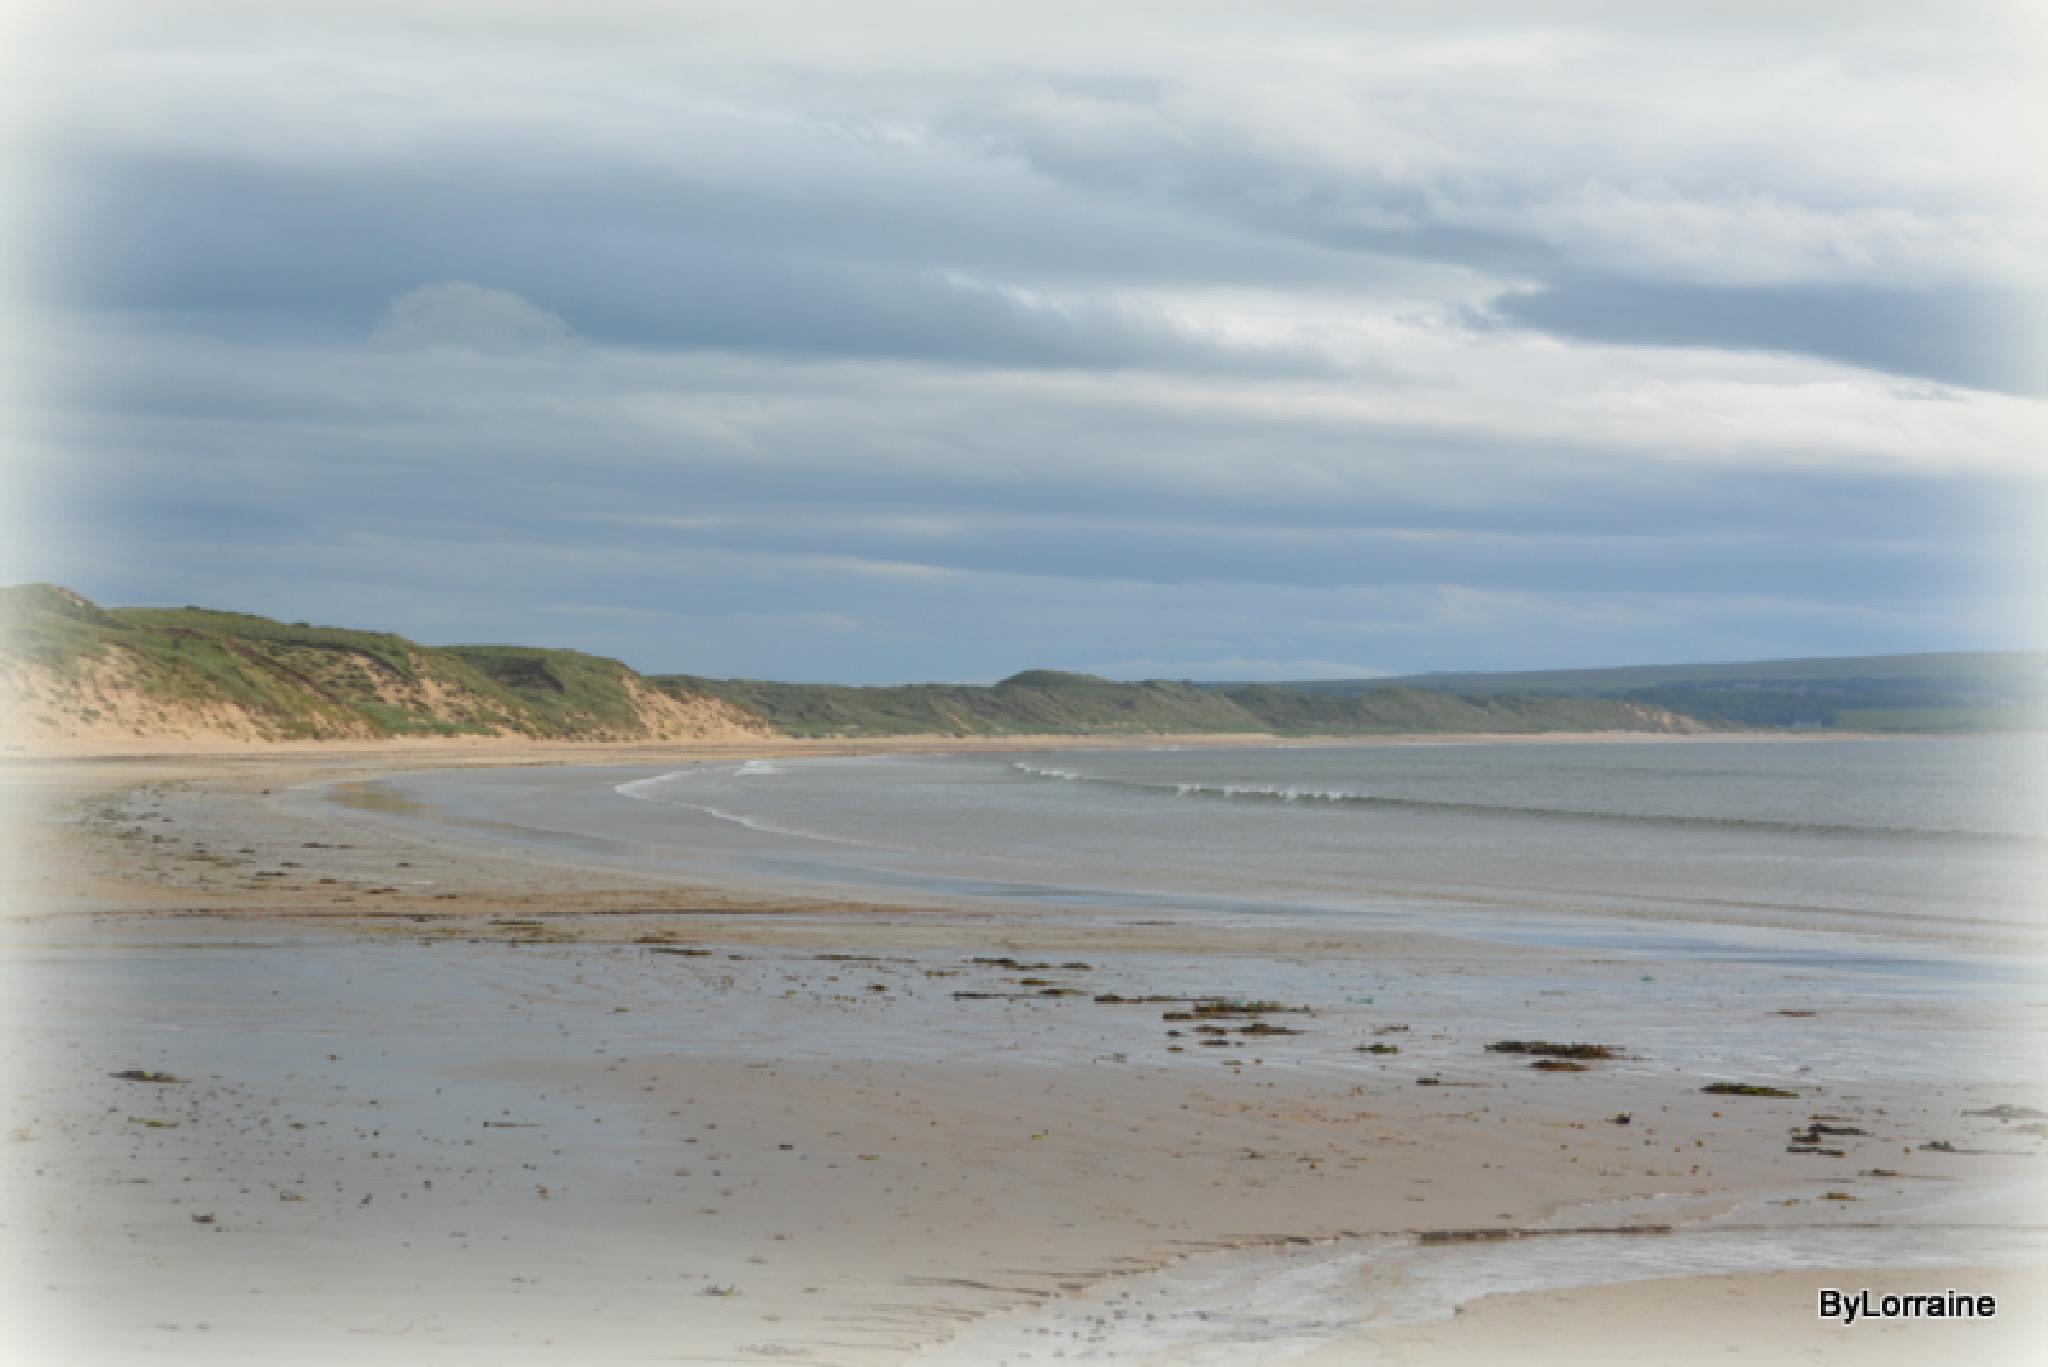 Dunnet Bay by Lorraine. Sgt